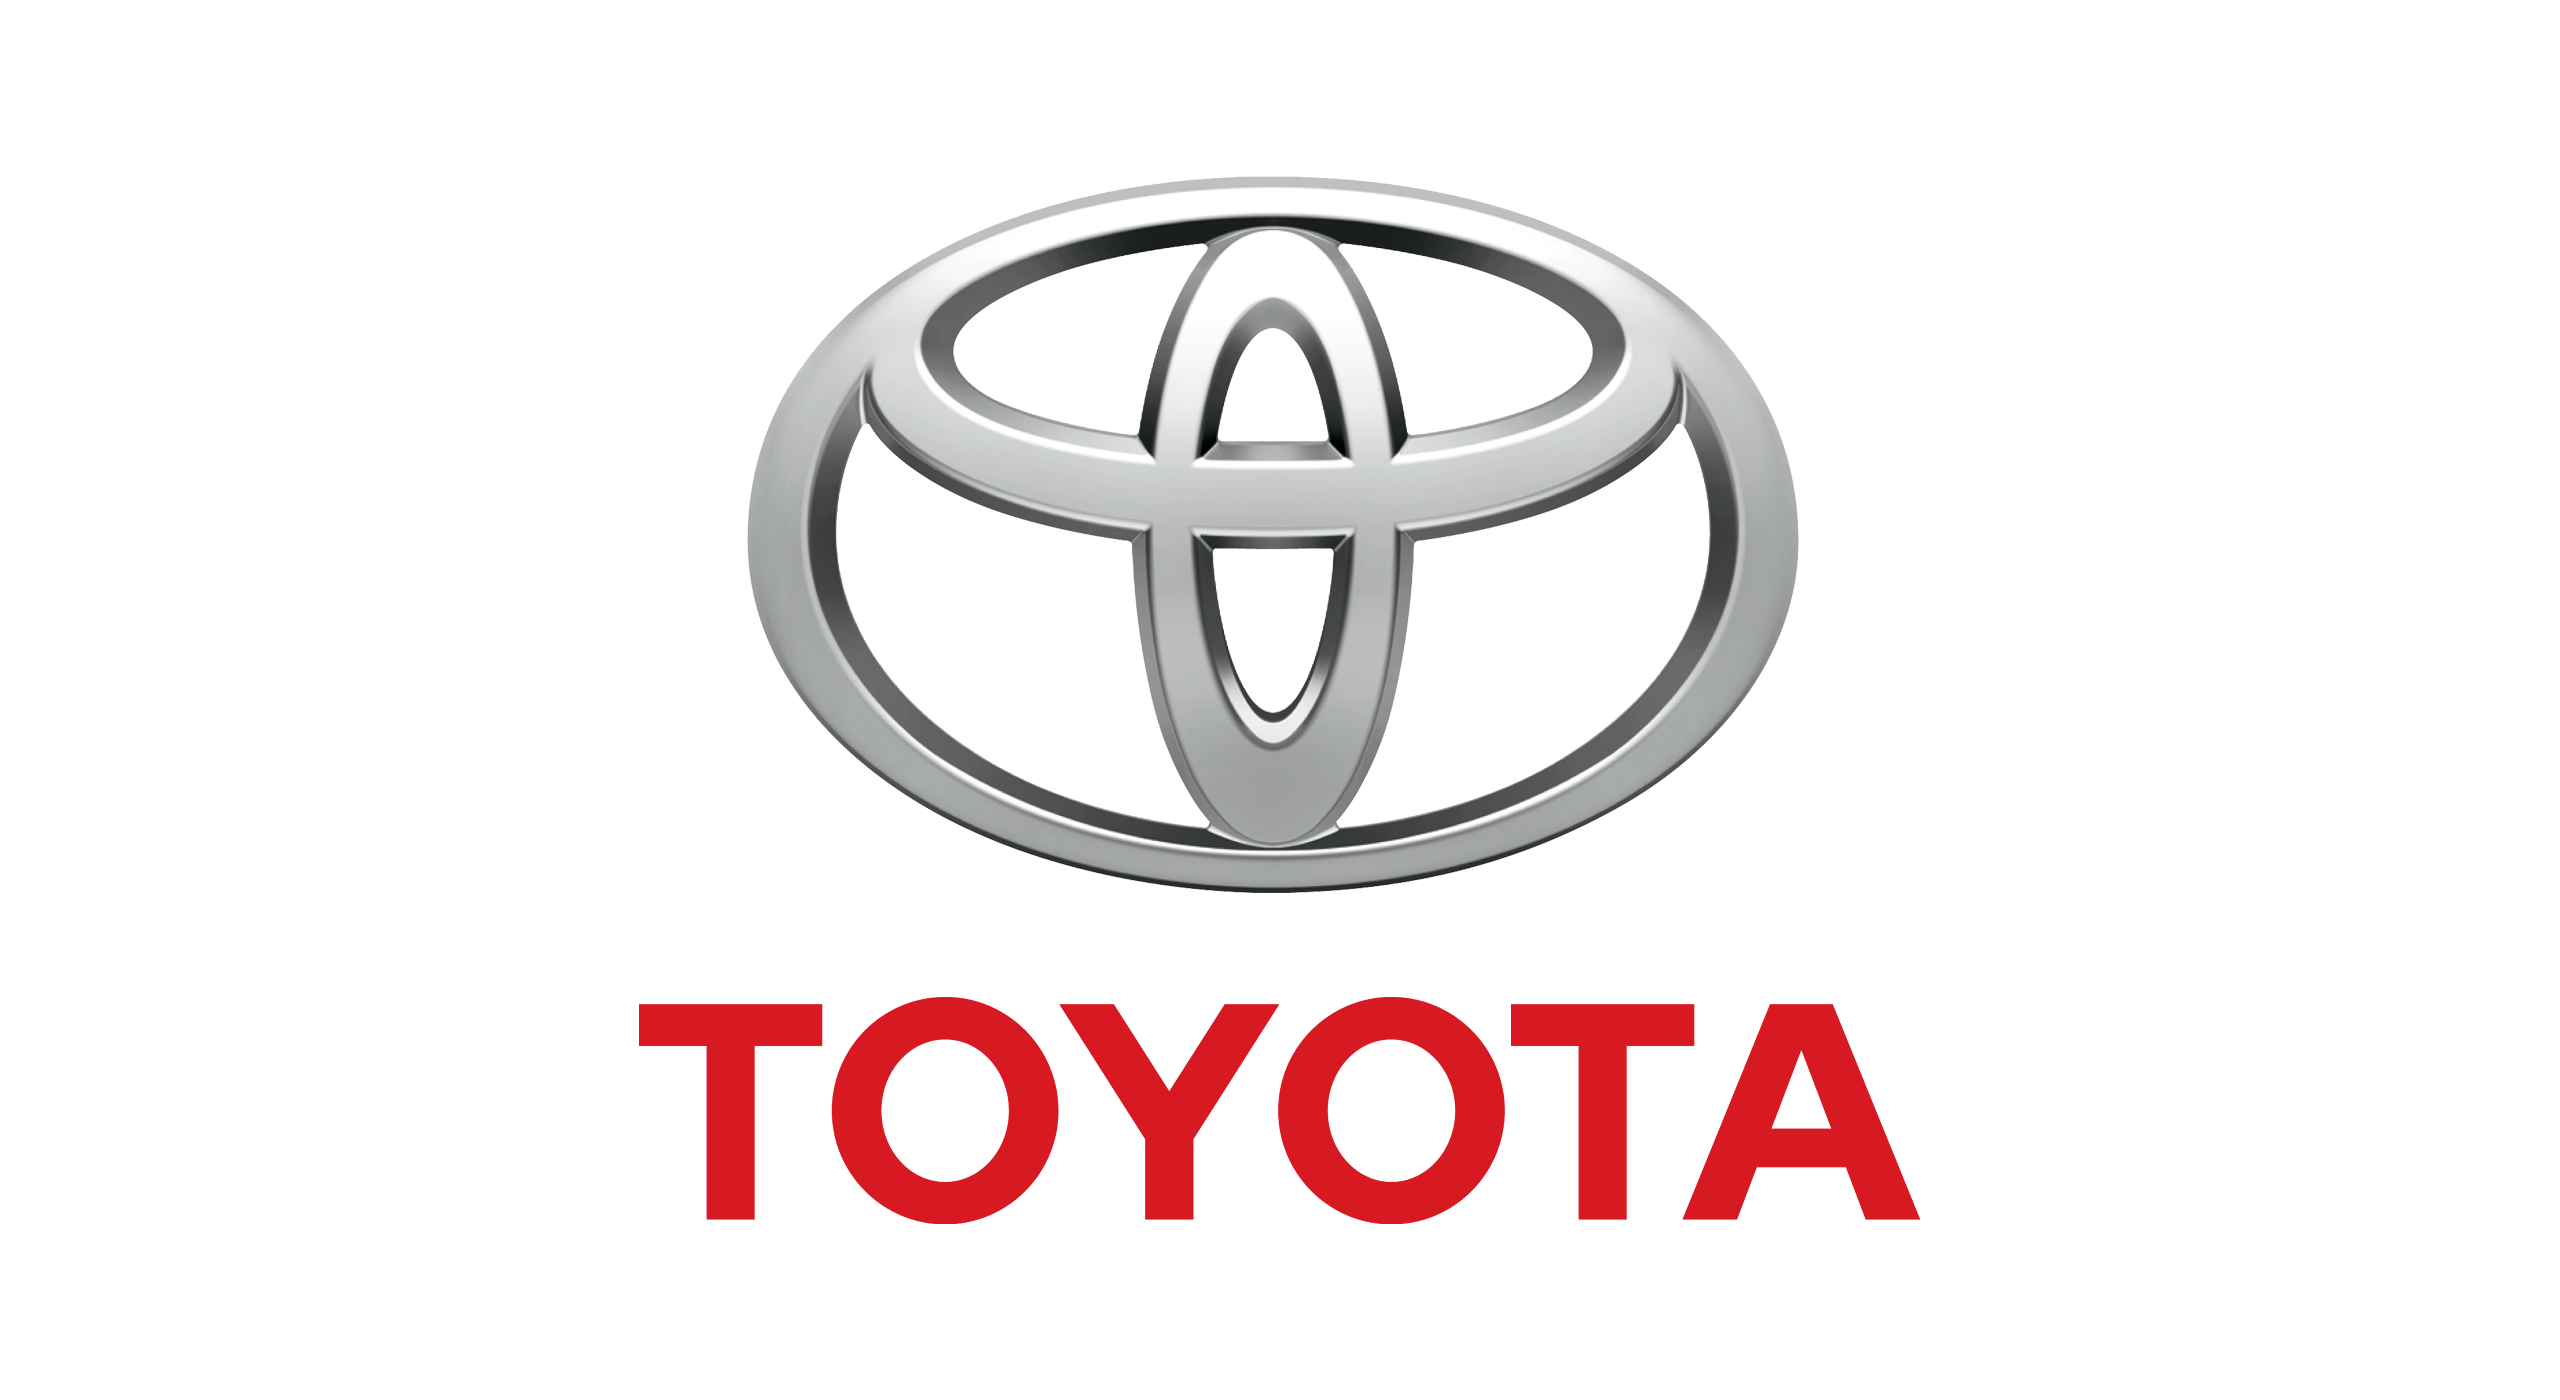 Toyota Logo (1989-Present) 25